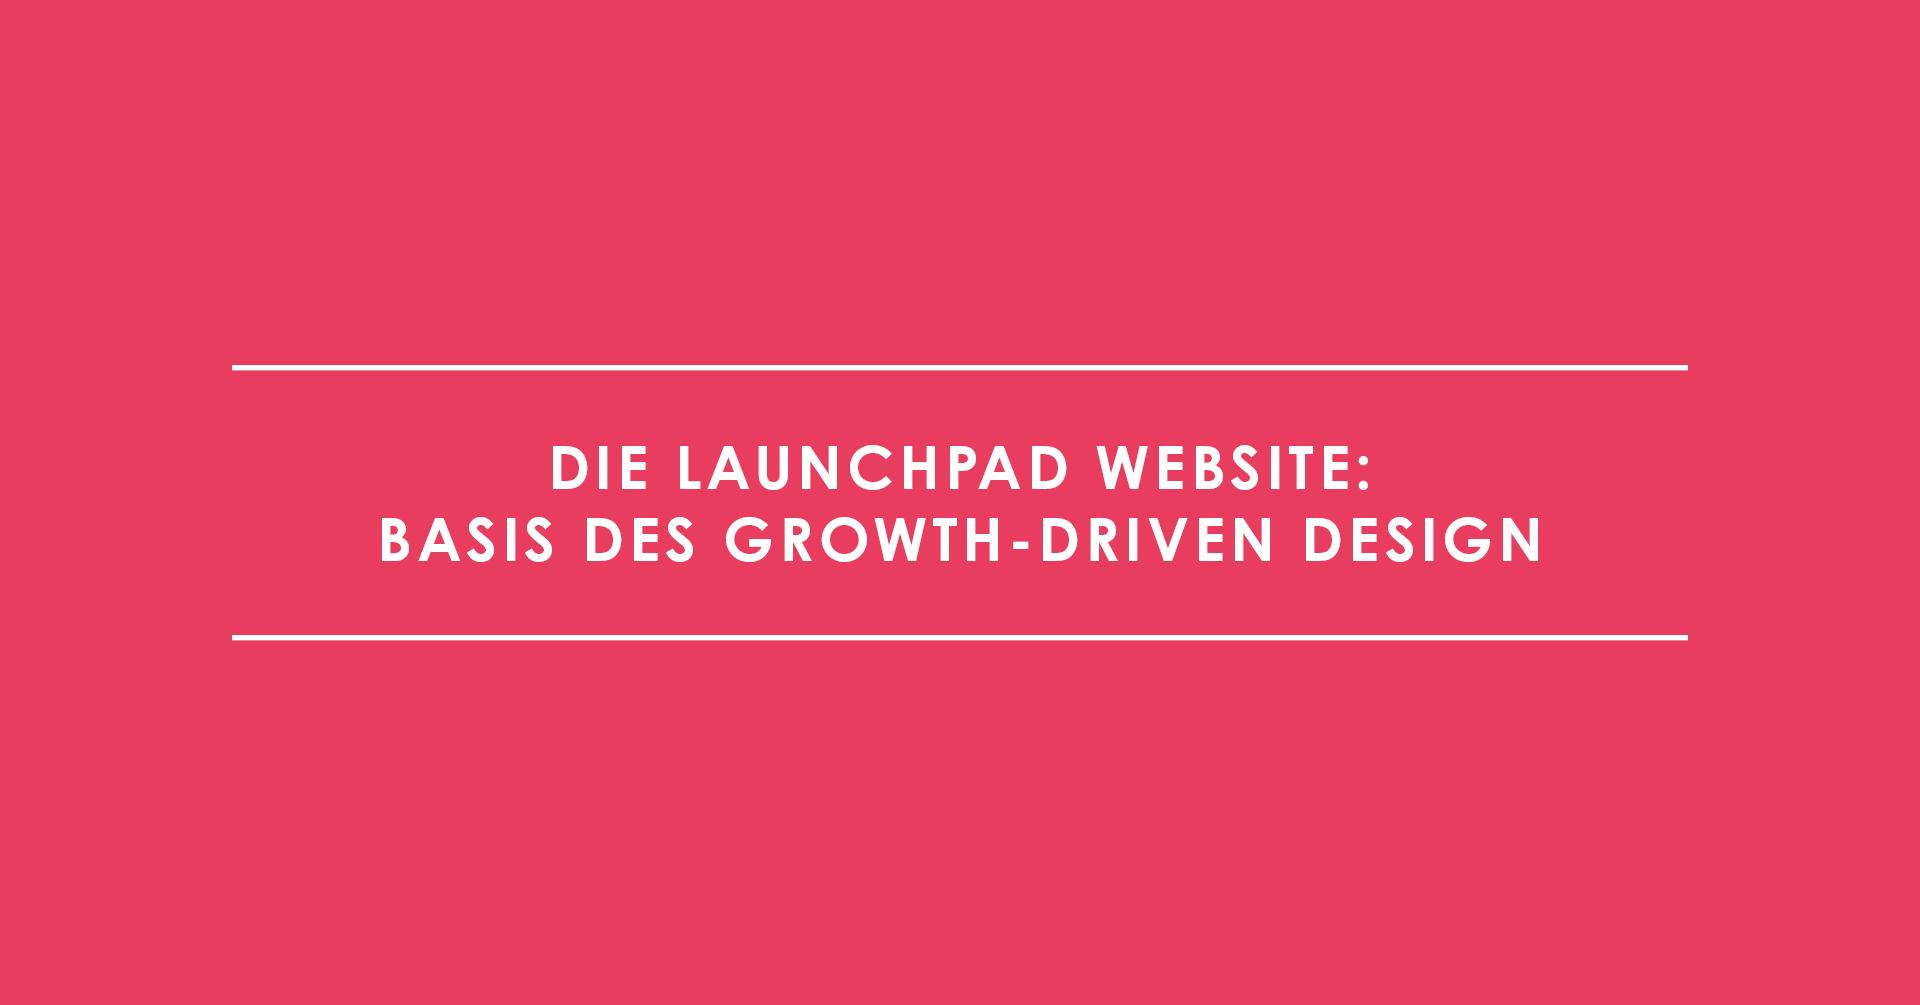 Die Launchpad Website: Basis des Growth-Driven Design